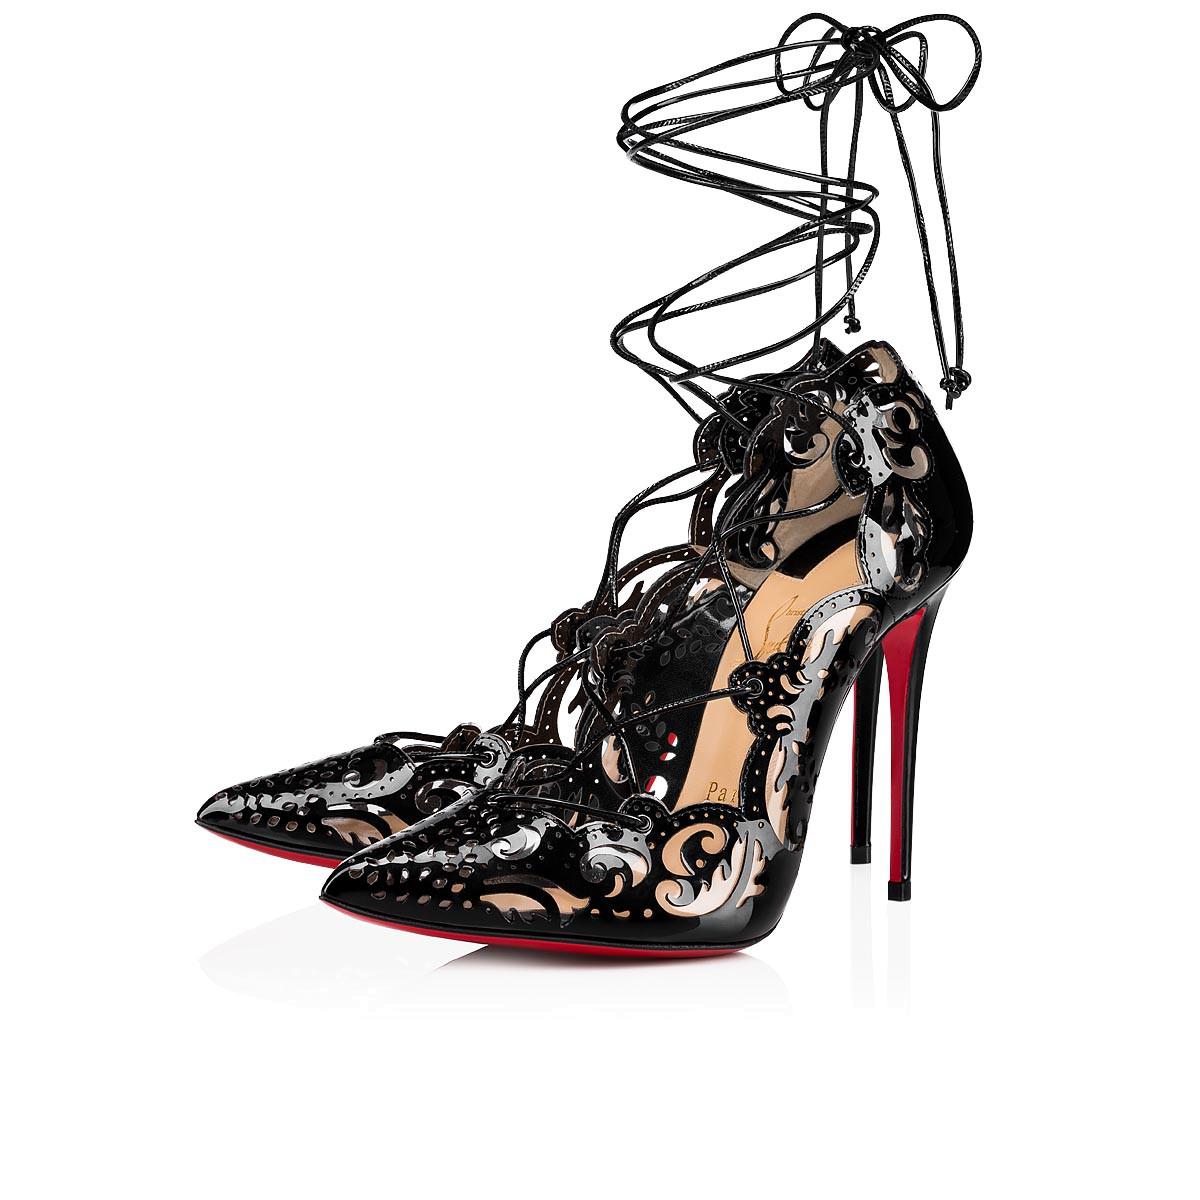 Shoes - Impera - Christian Louboutin